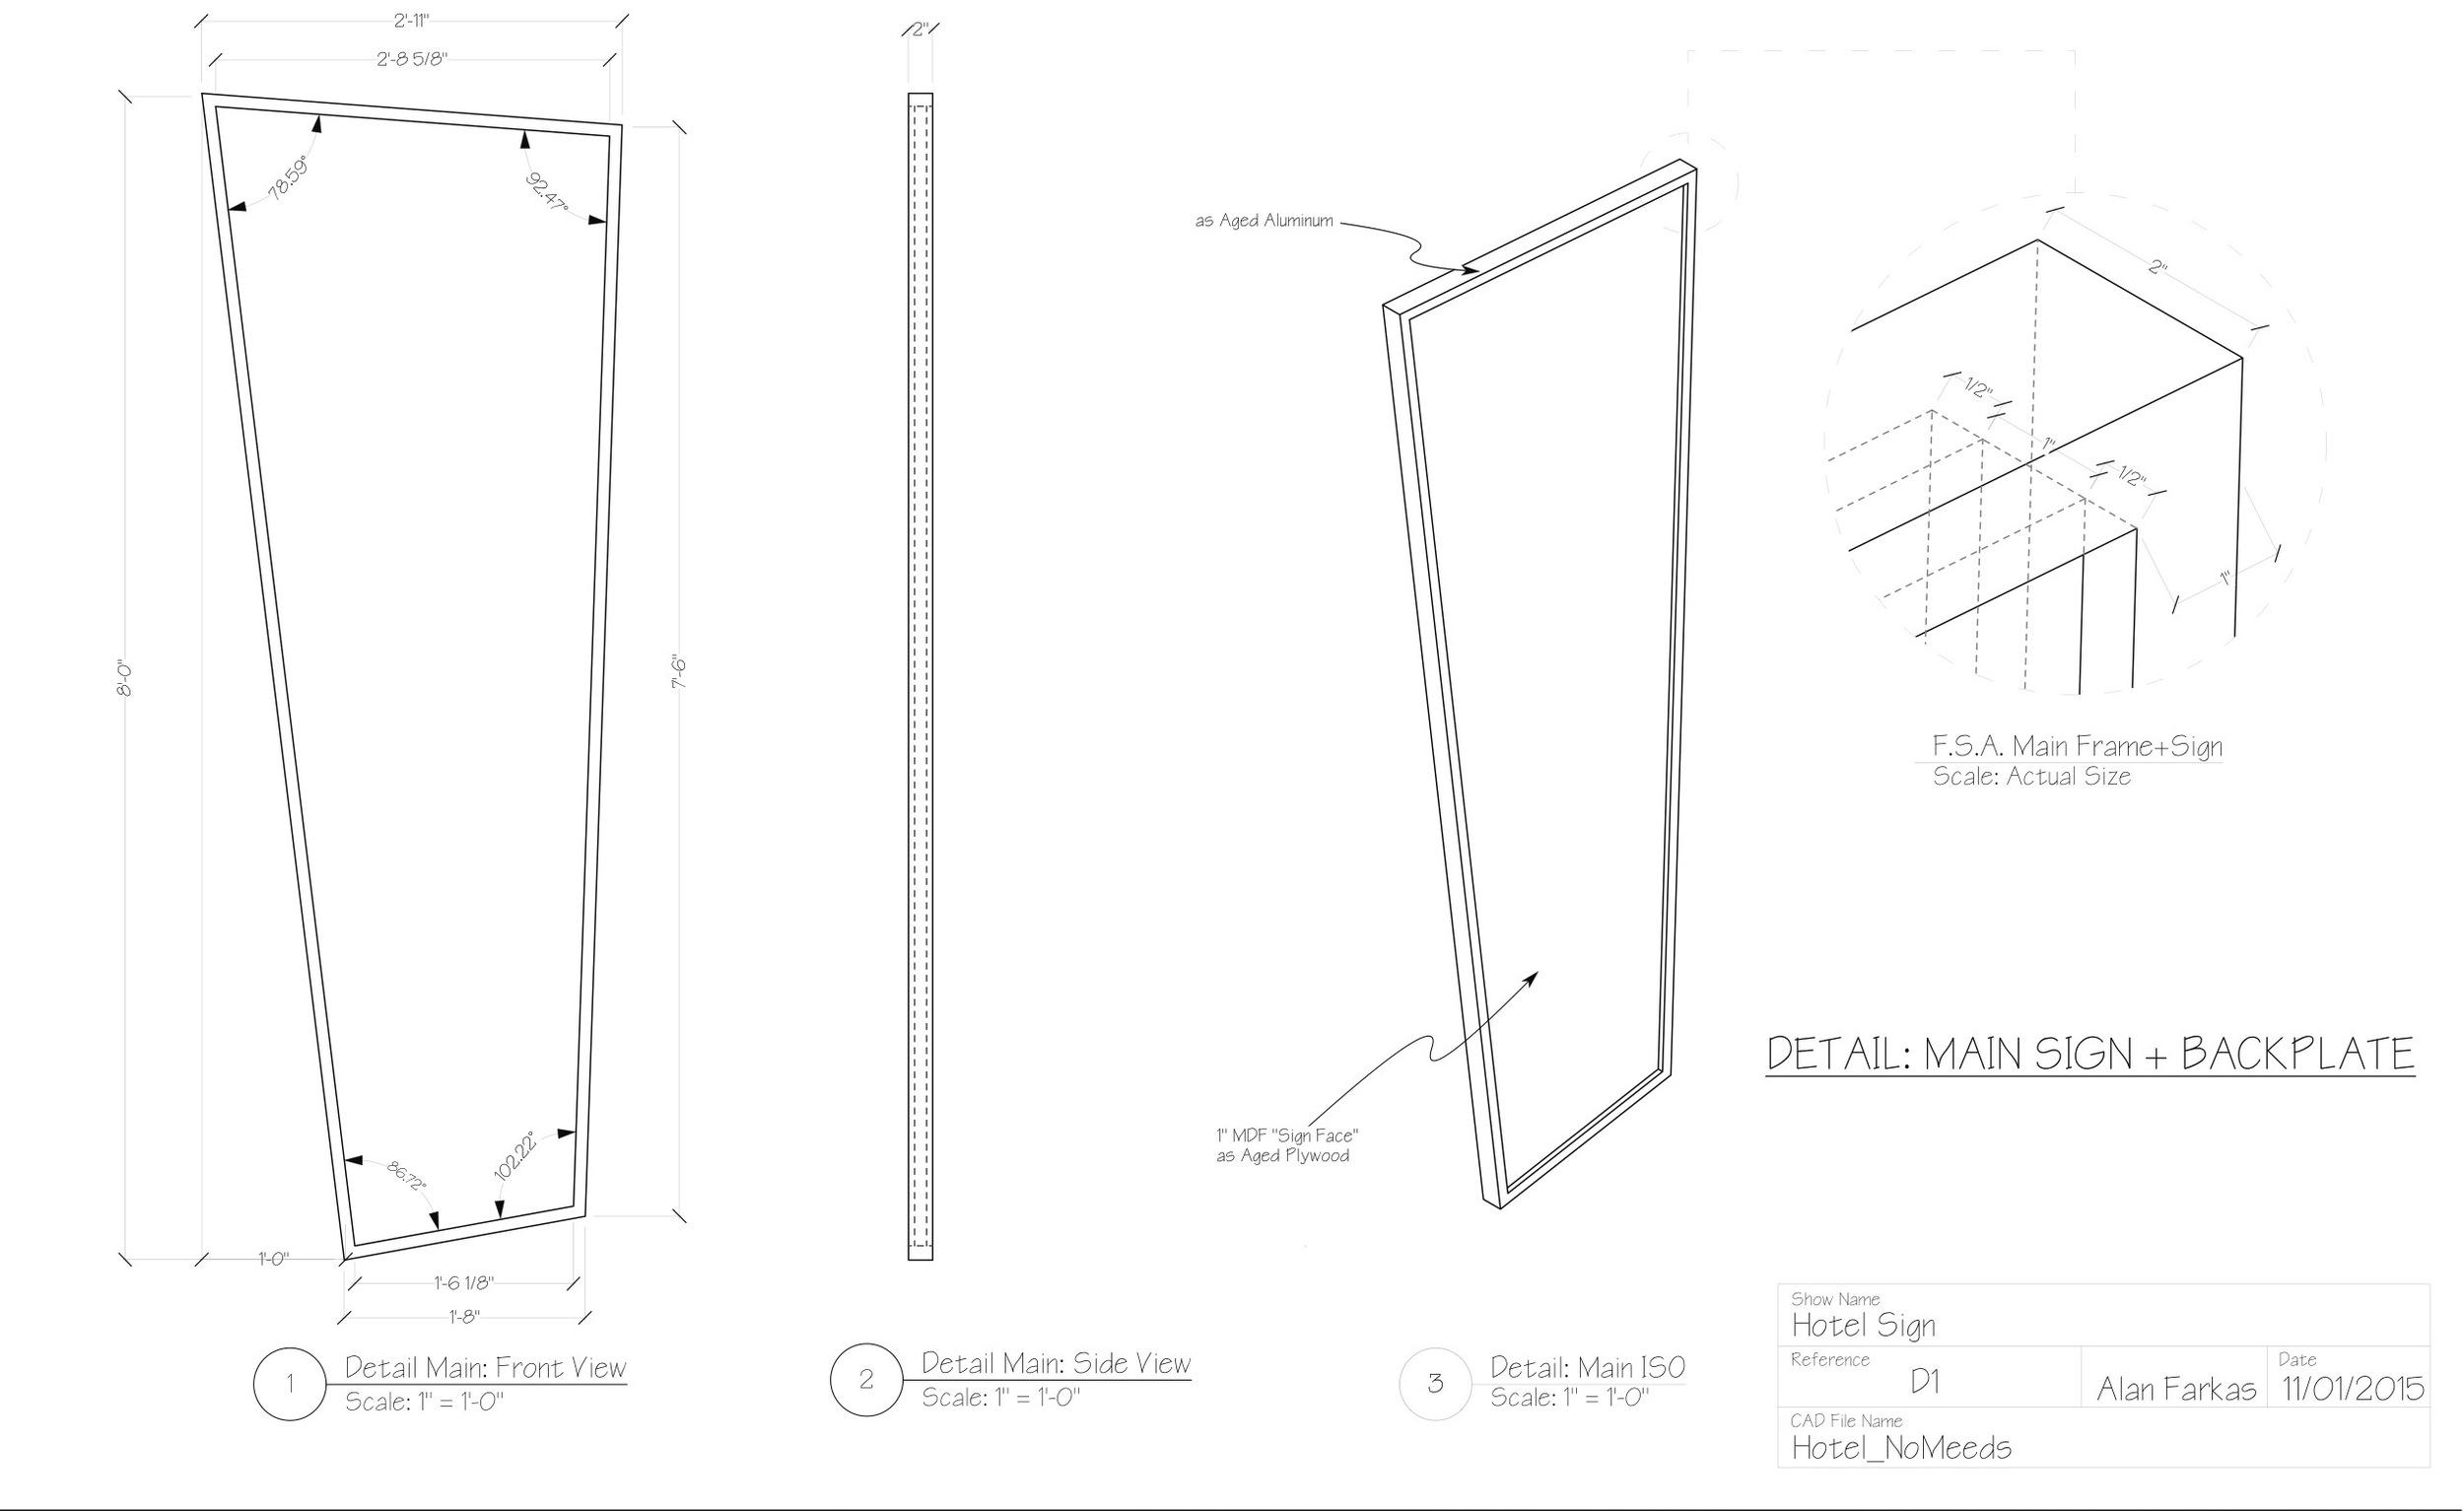 Alan Farkas_3D Set Design + Illustration_Reduced 12.jpeg